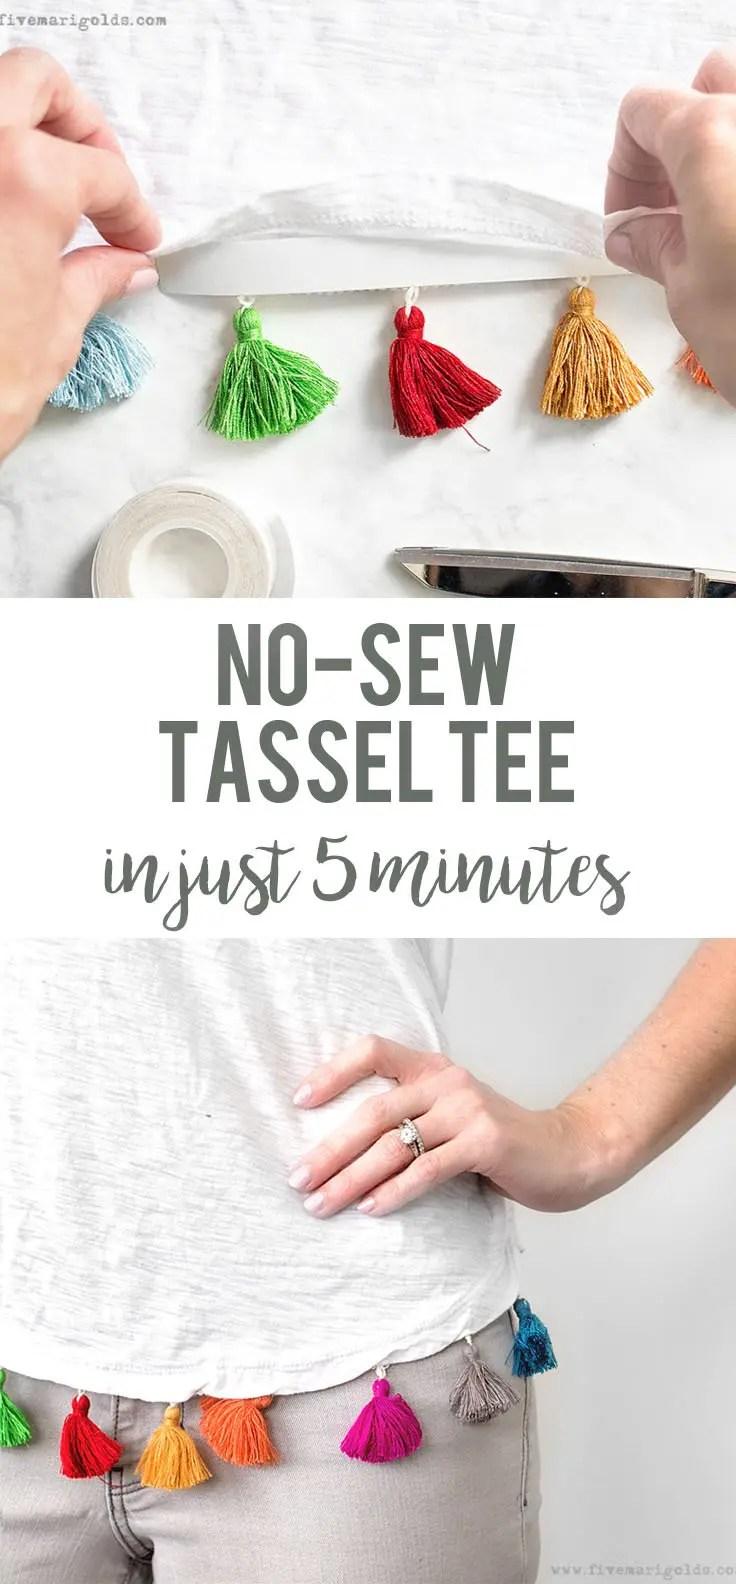 DIY No-Sew Tassel Tee